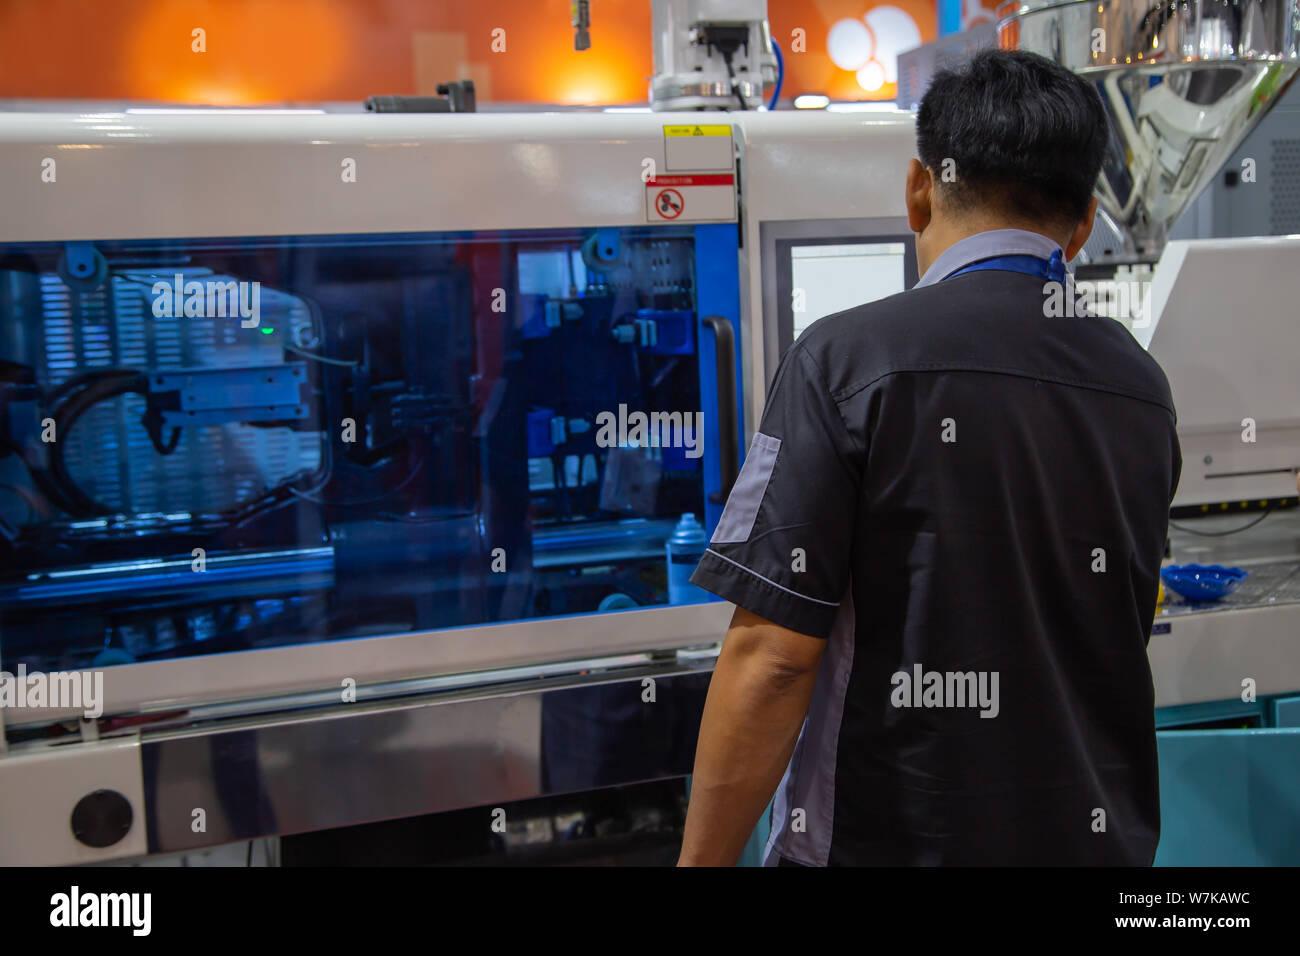 Injection Molding Machine Stock Photos & Injection Molding